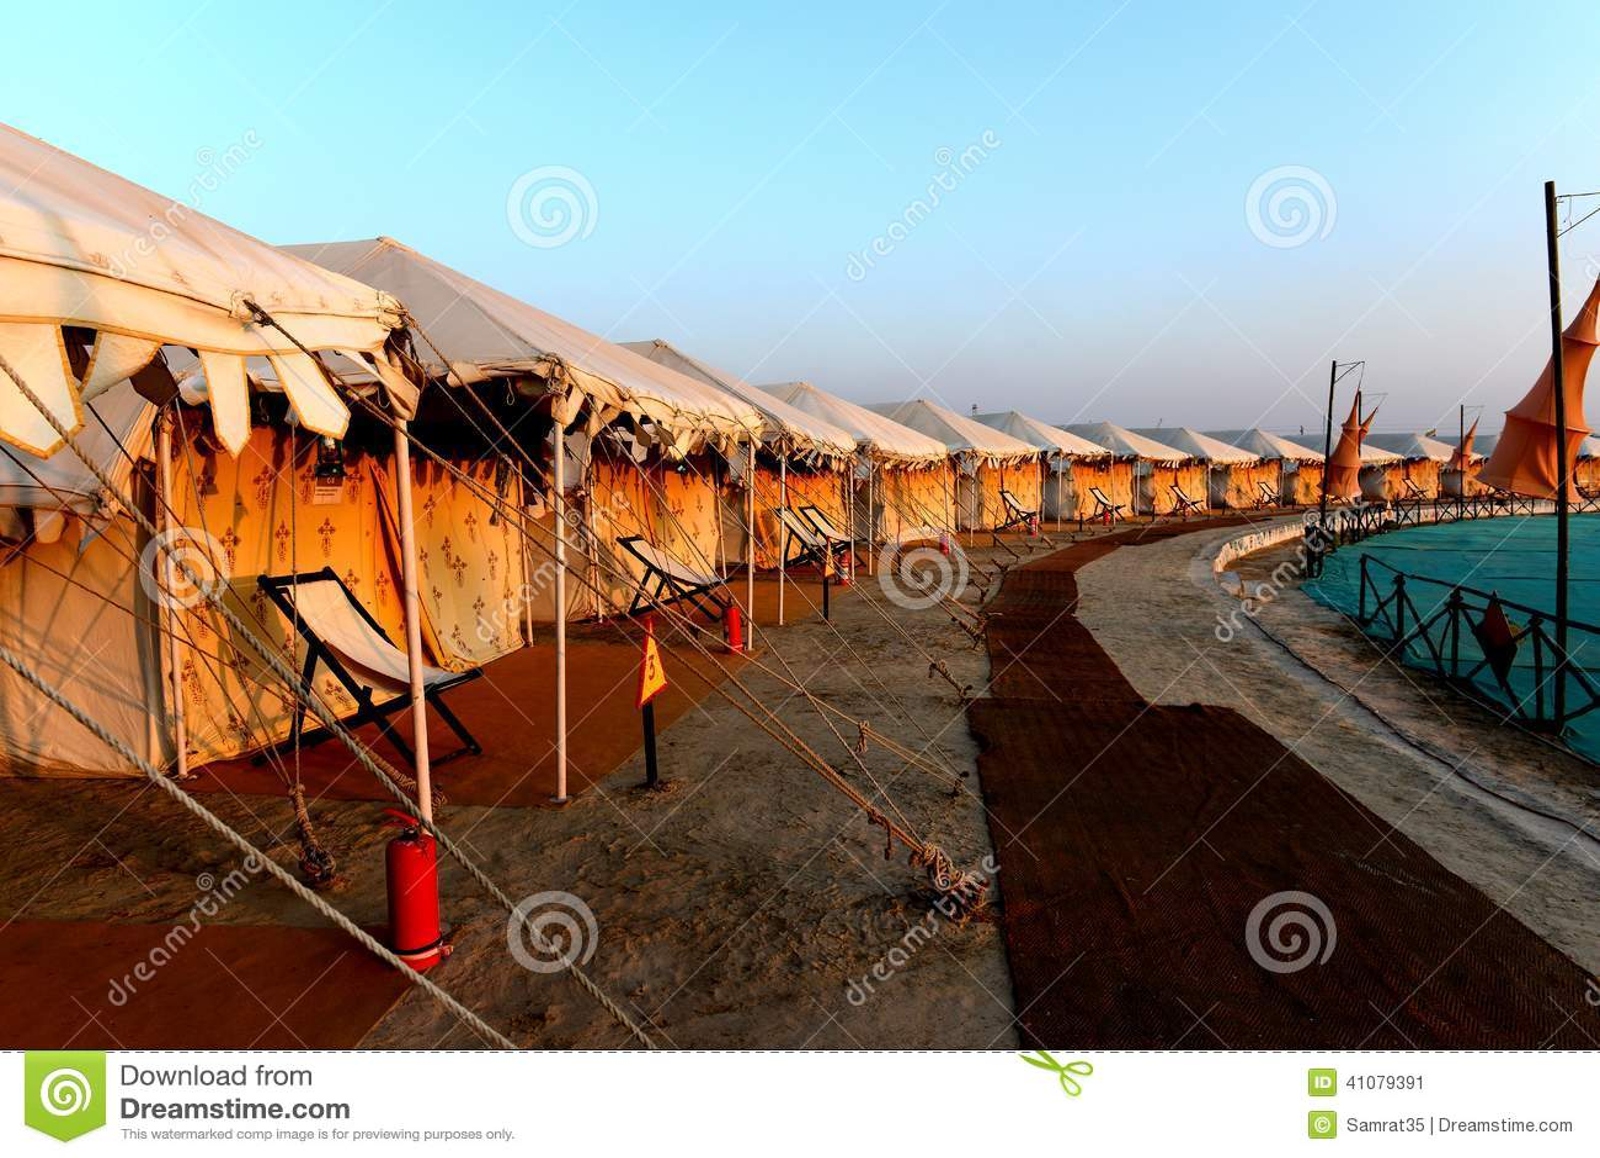 Festival de Kutch du Goudjerate